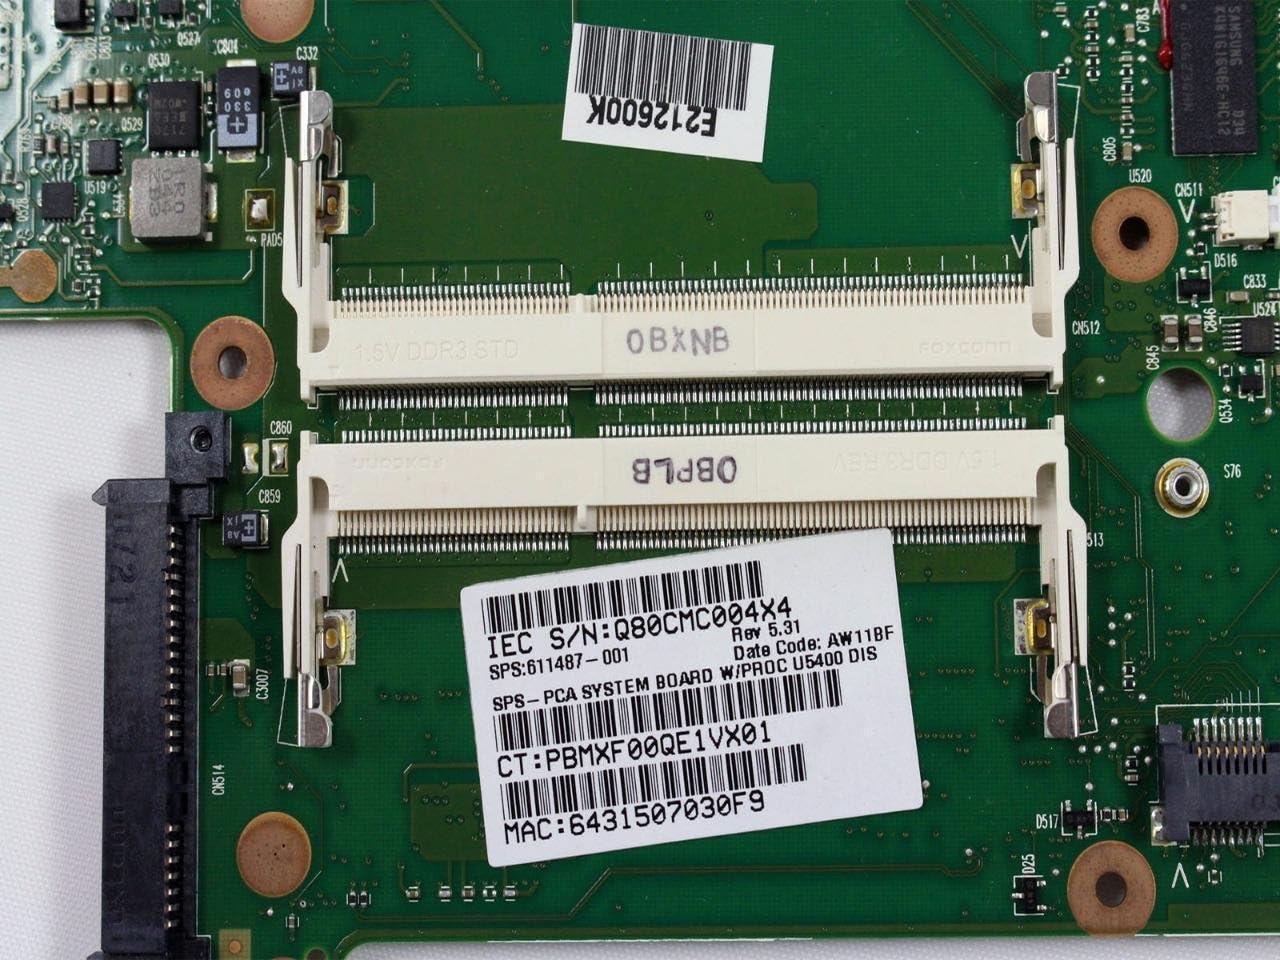 HP Touchsmart TM2-2100 Intel Laptop Motherboard SU5400 1.2GHz CPU 616627-001